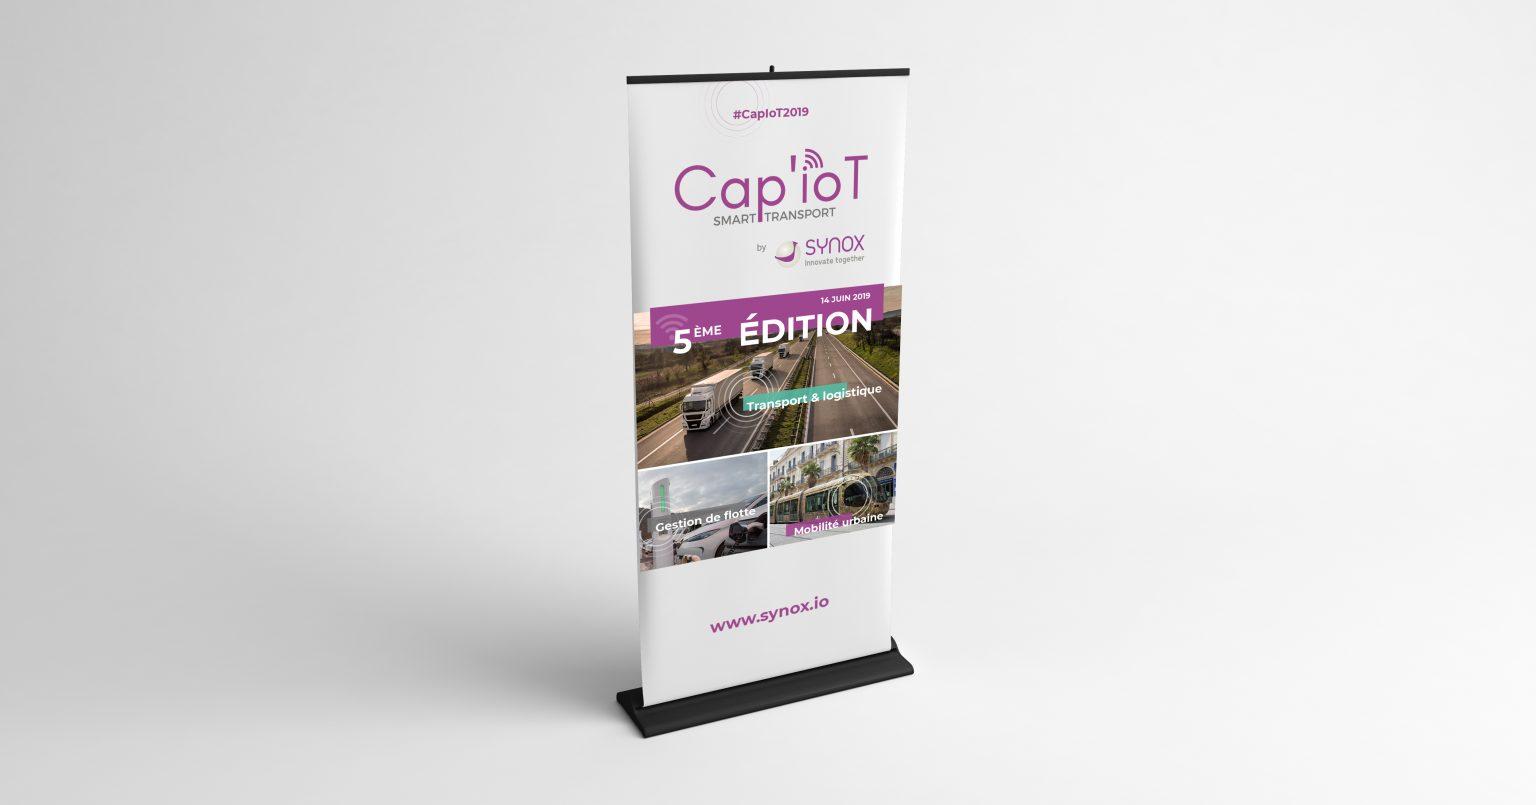 capiot_roll